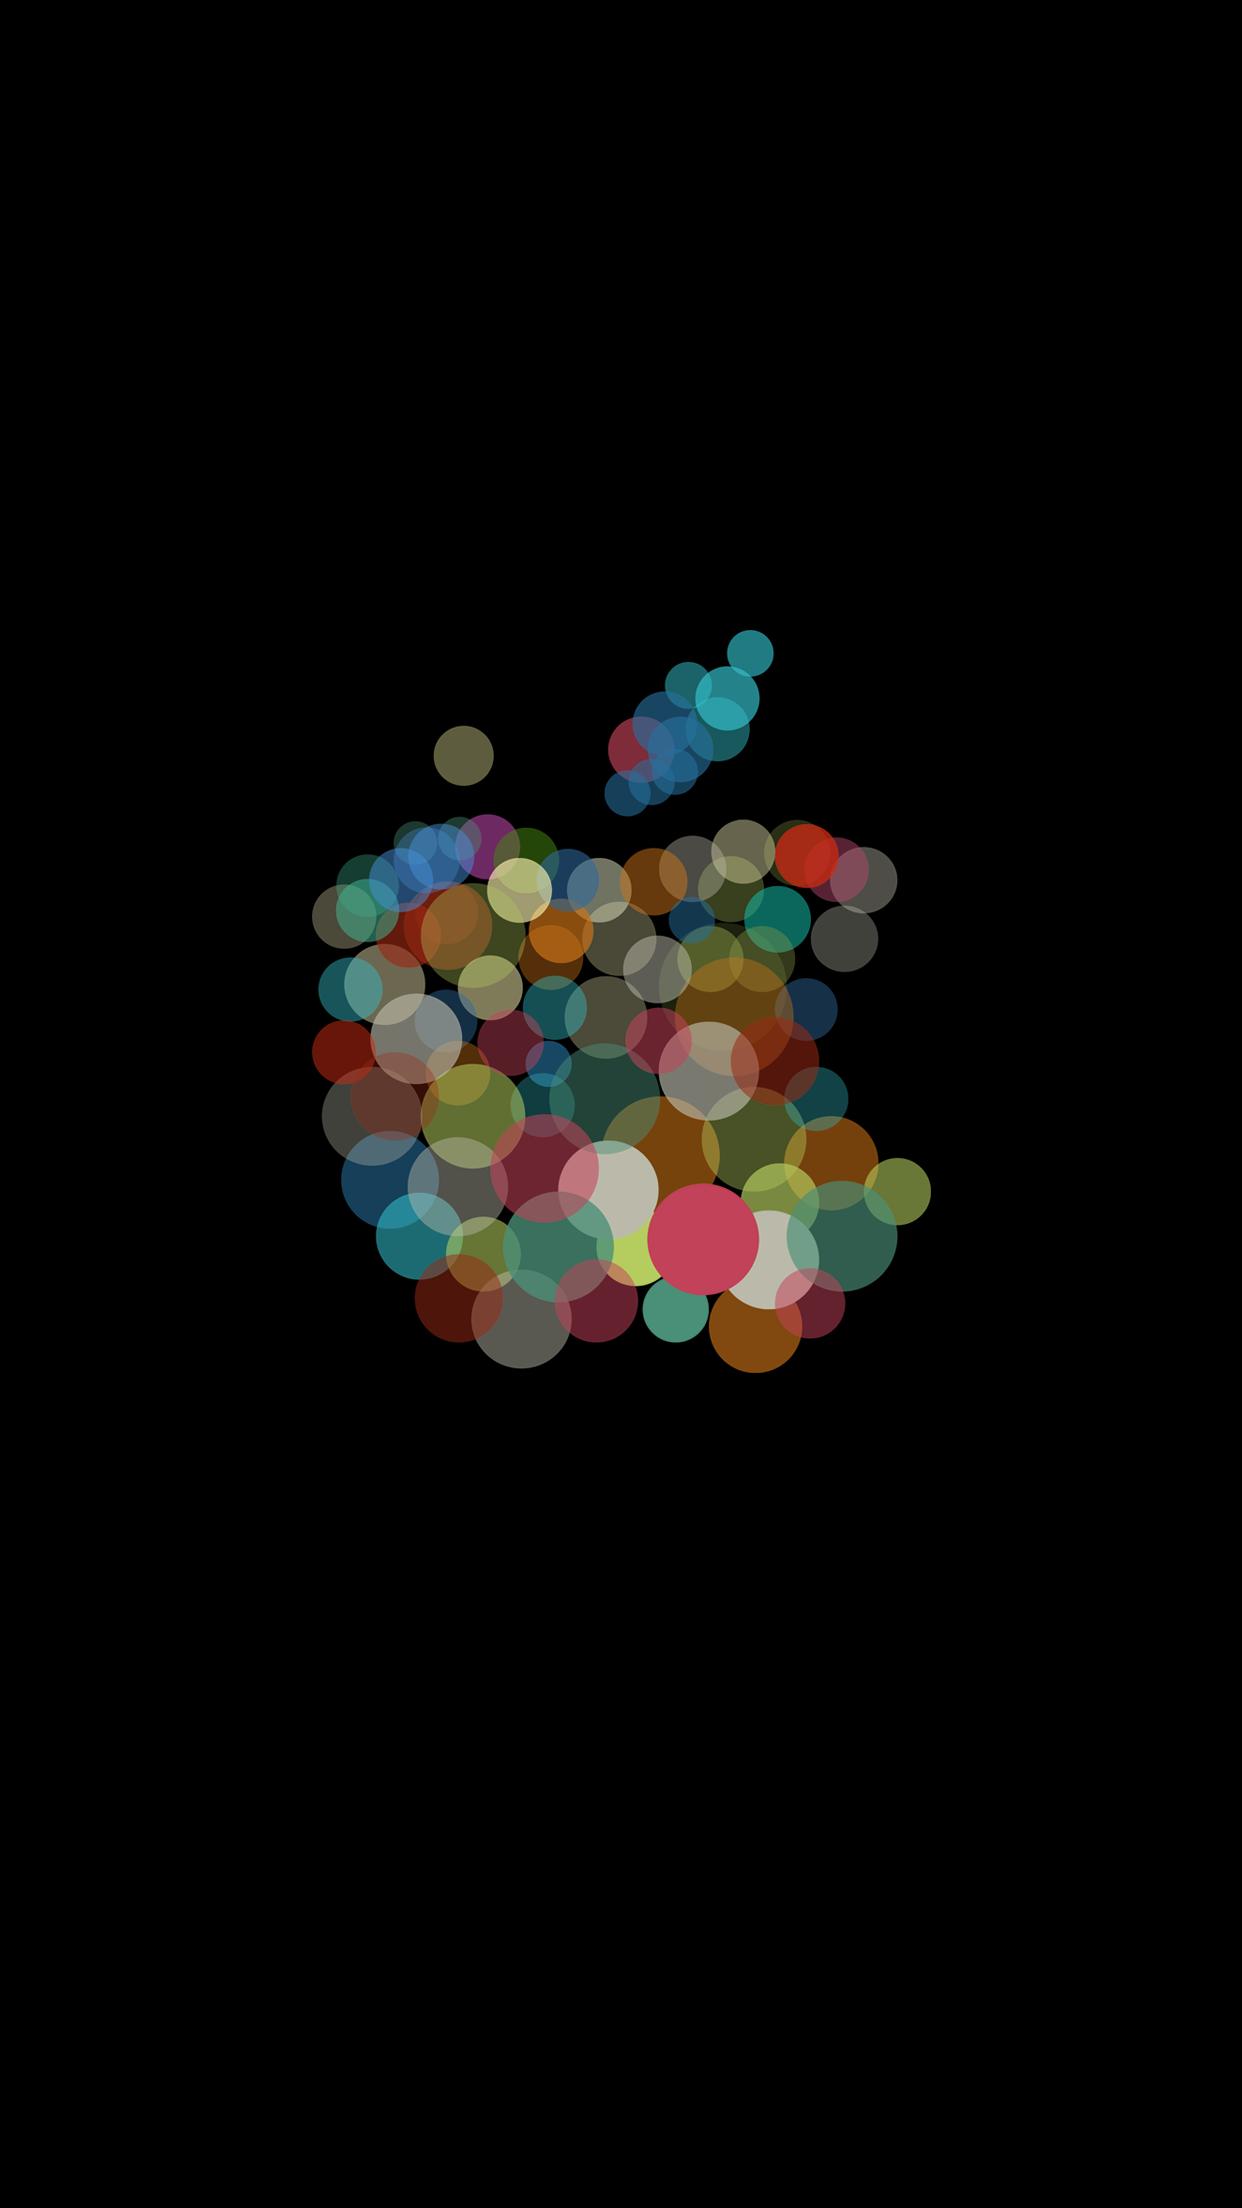 iphone 6 plus wallpaper too big hd image | アップル | Hintergründe